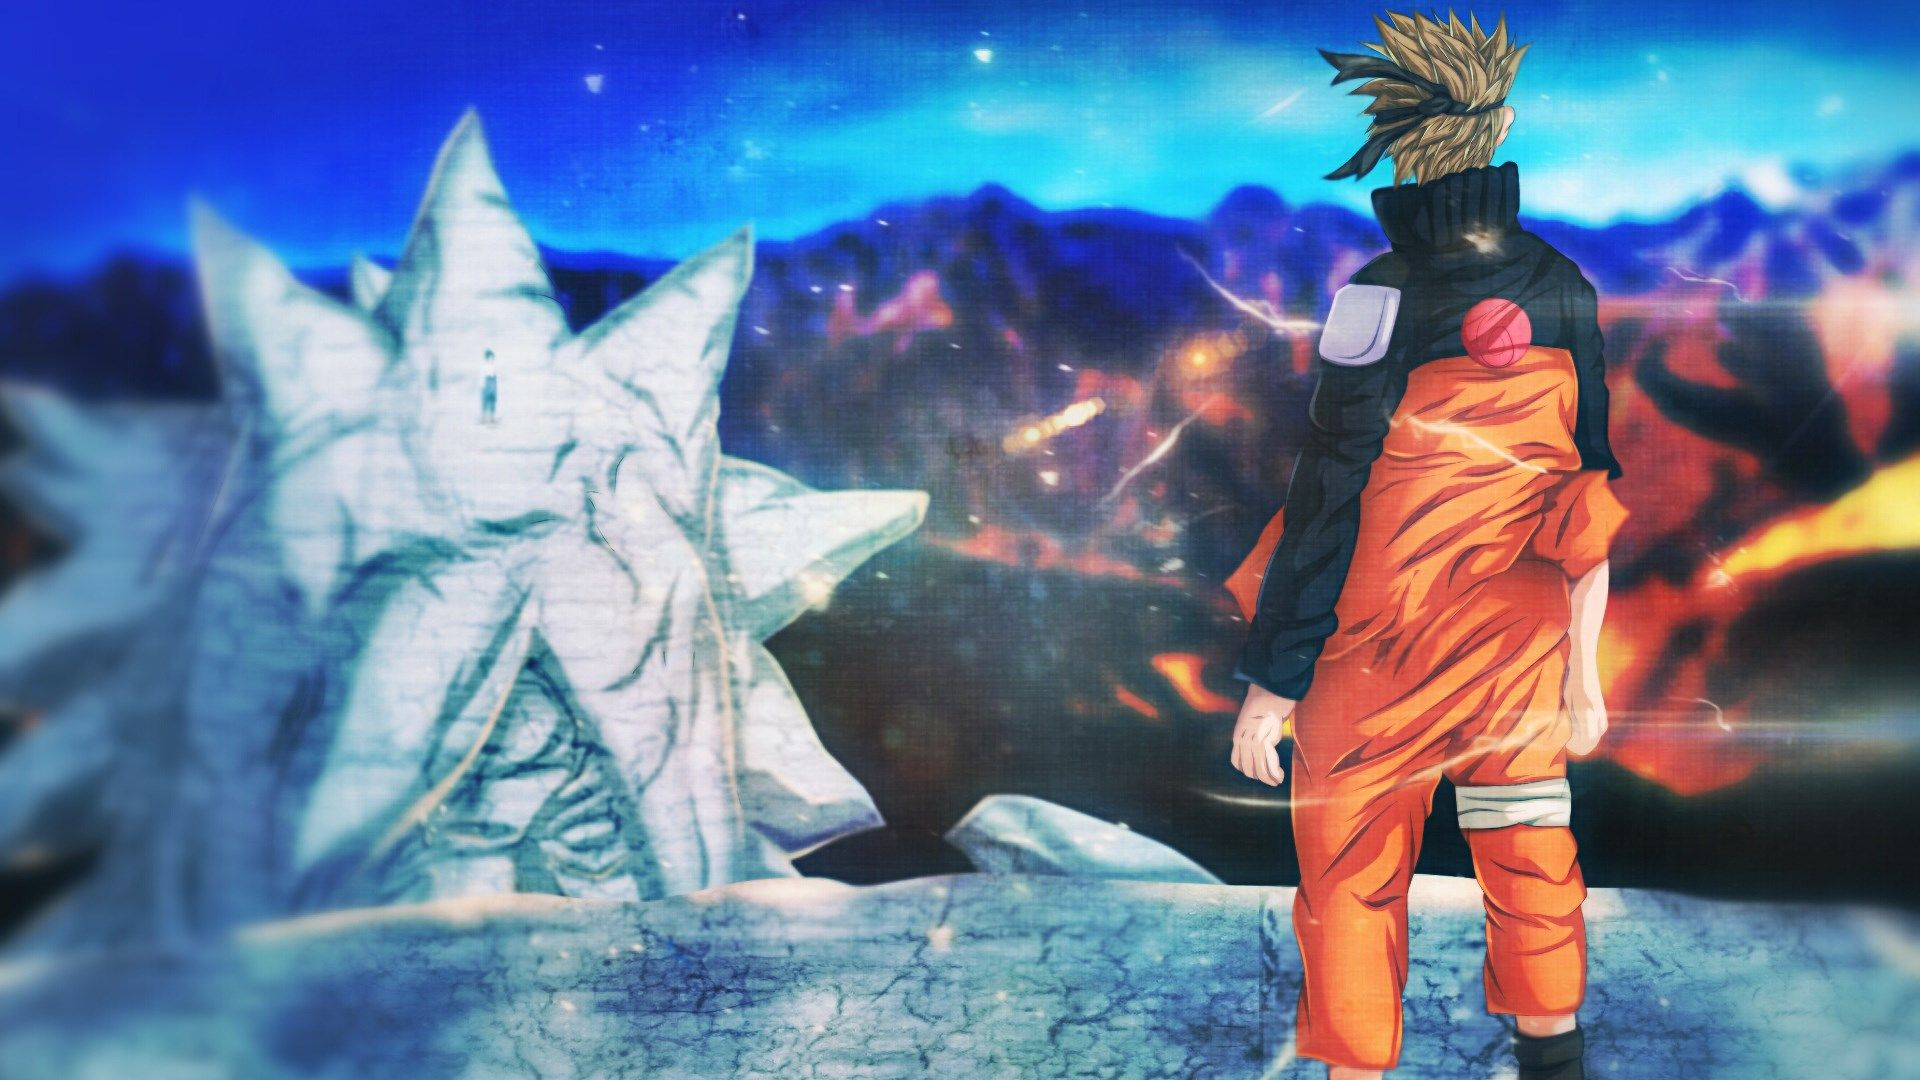 Beautiful Wallpaper Naruto Boruto - 185b227a926f90dced0bcc47b0442e37  Best Photo Reference_383514.jpg